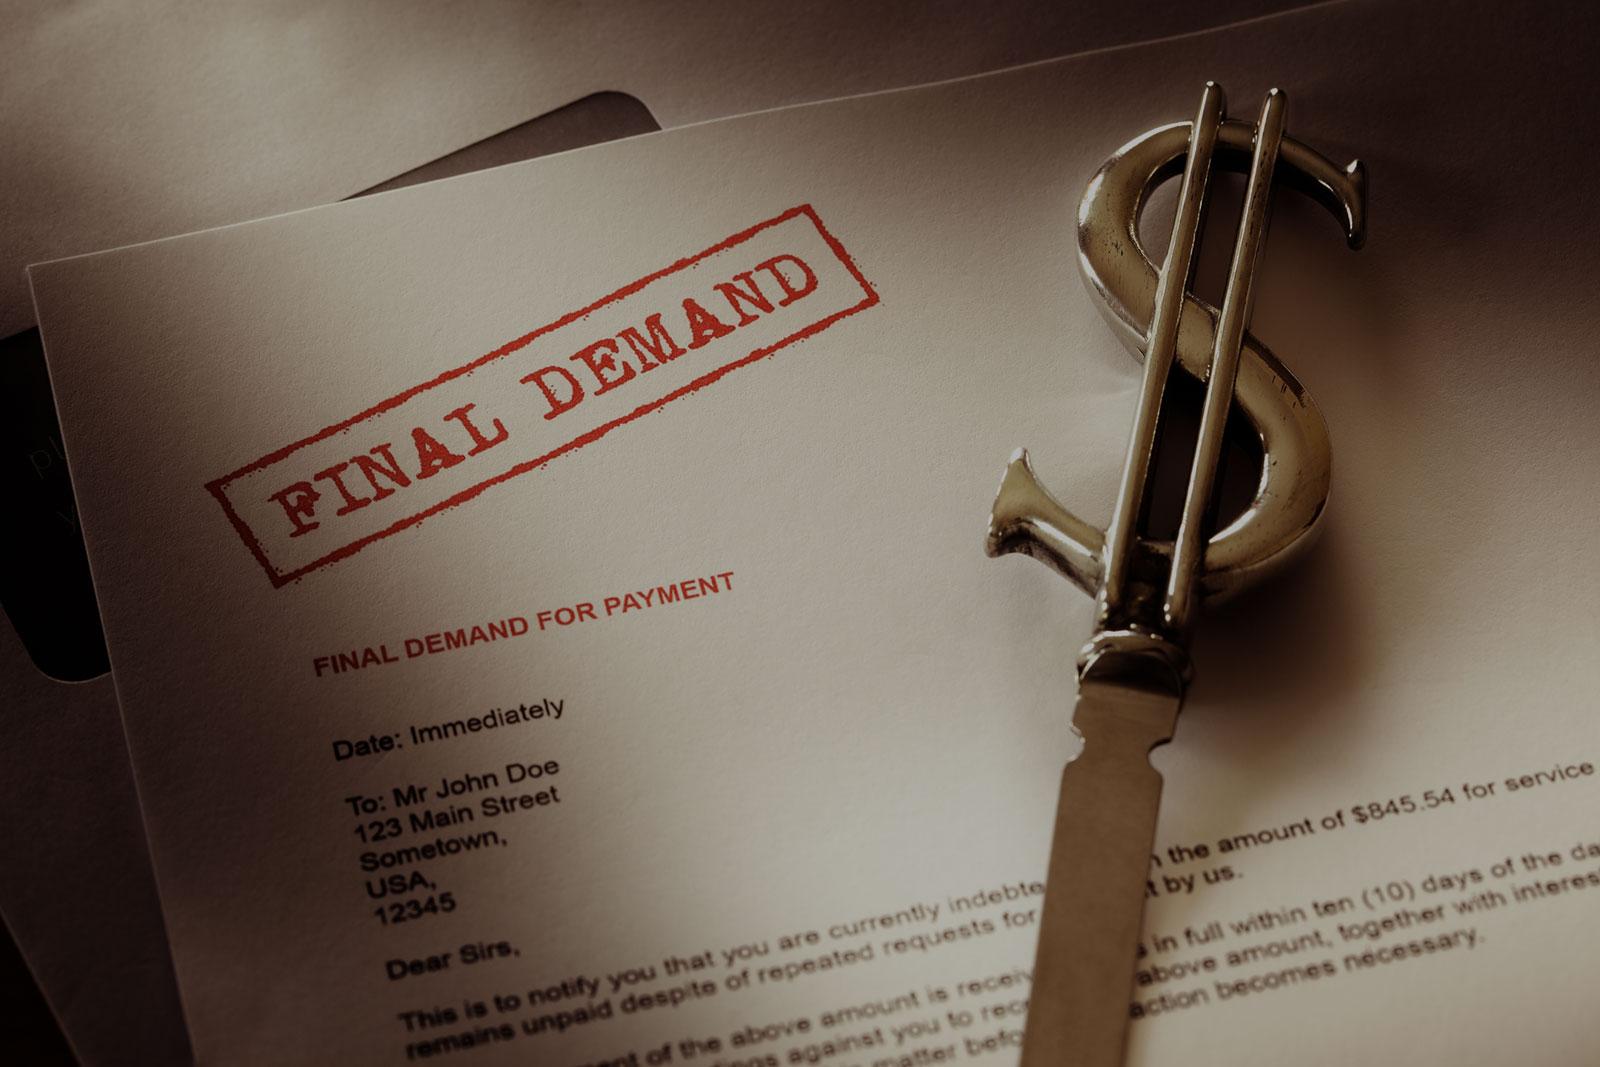 Judgement Enforcement & Collection Header Background - Final Demand Letter with Metal Dollar Sign